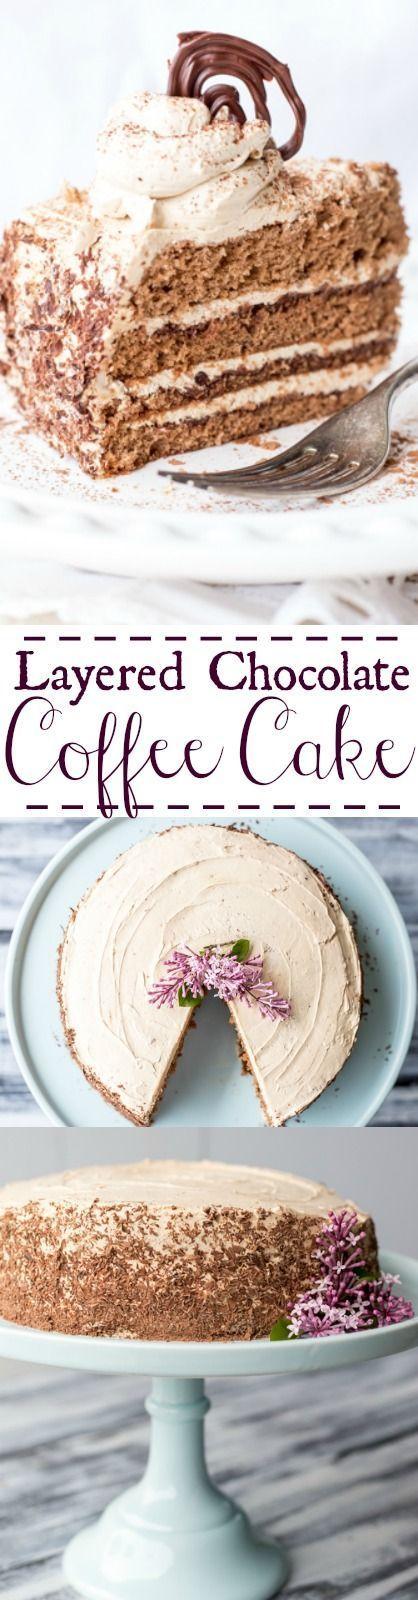 Layered Chocolate Coffee Cake. http://ValentinasCorner.com